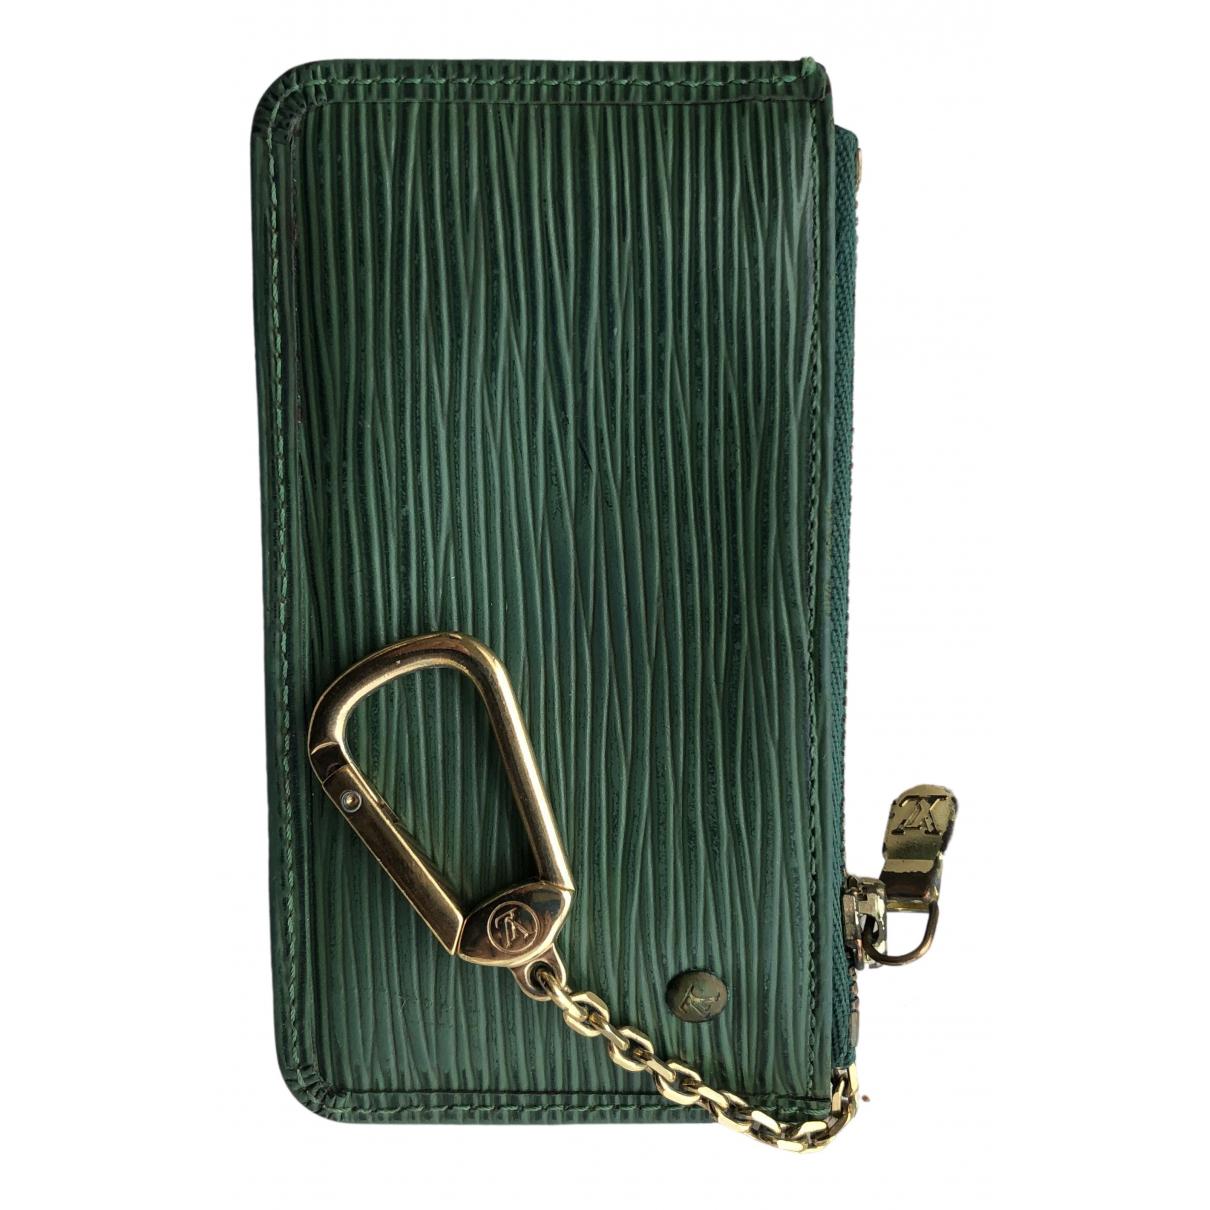 Louis Vuitton N Green Cloth Purses, wallet & cases for Women N